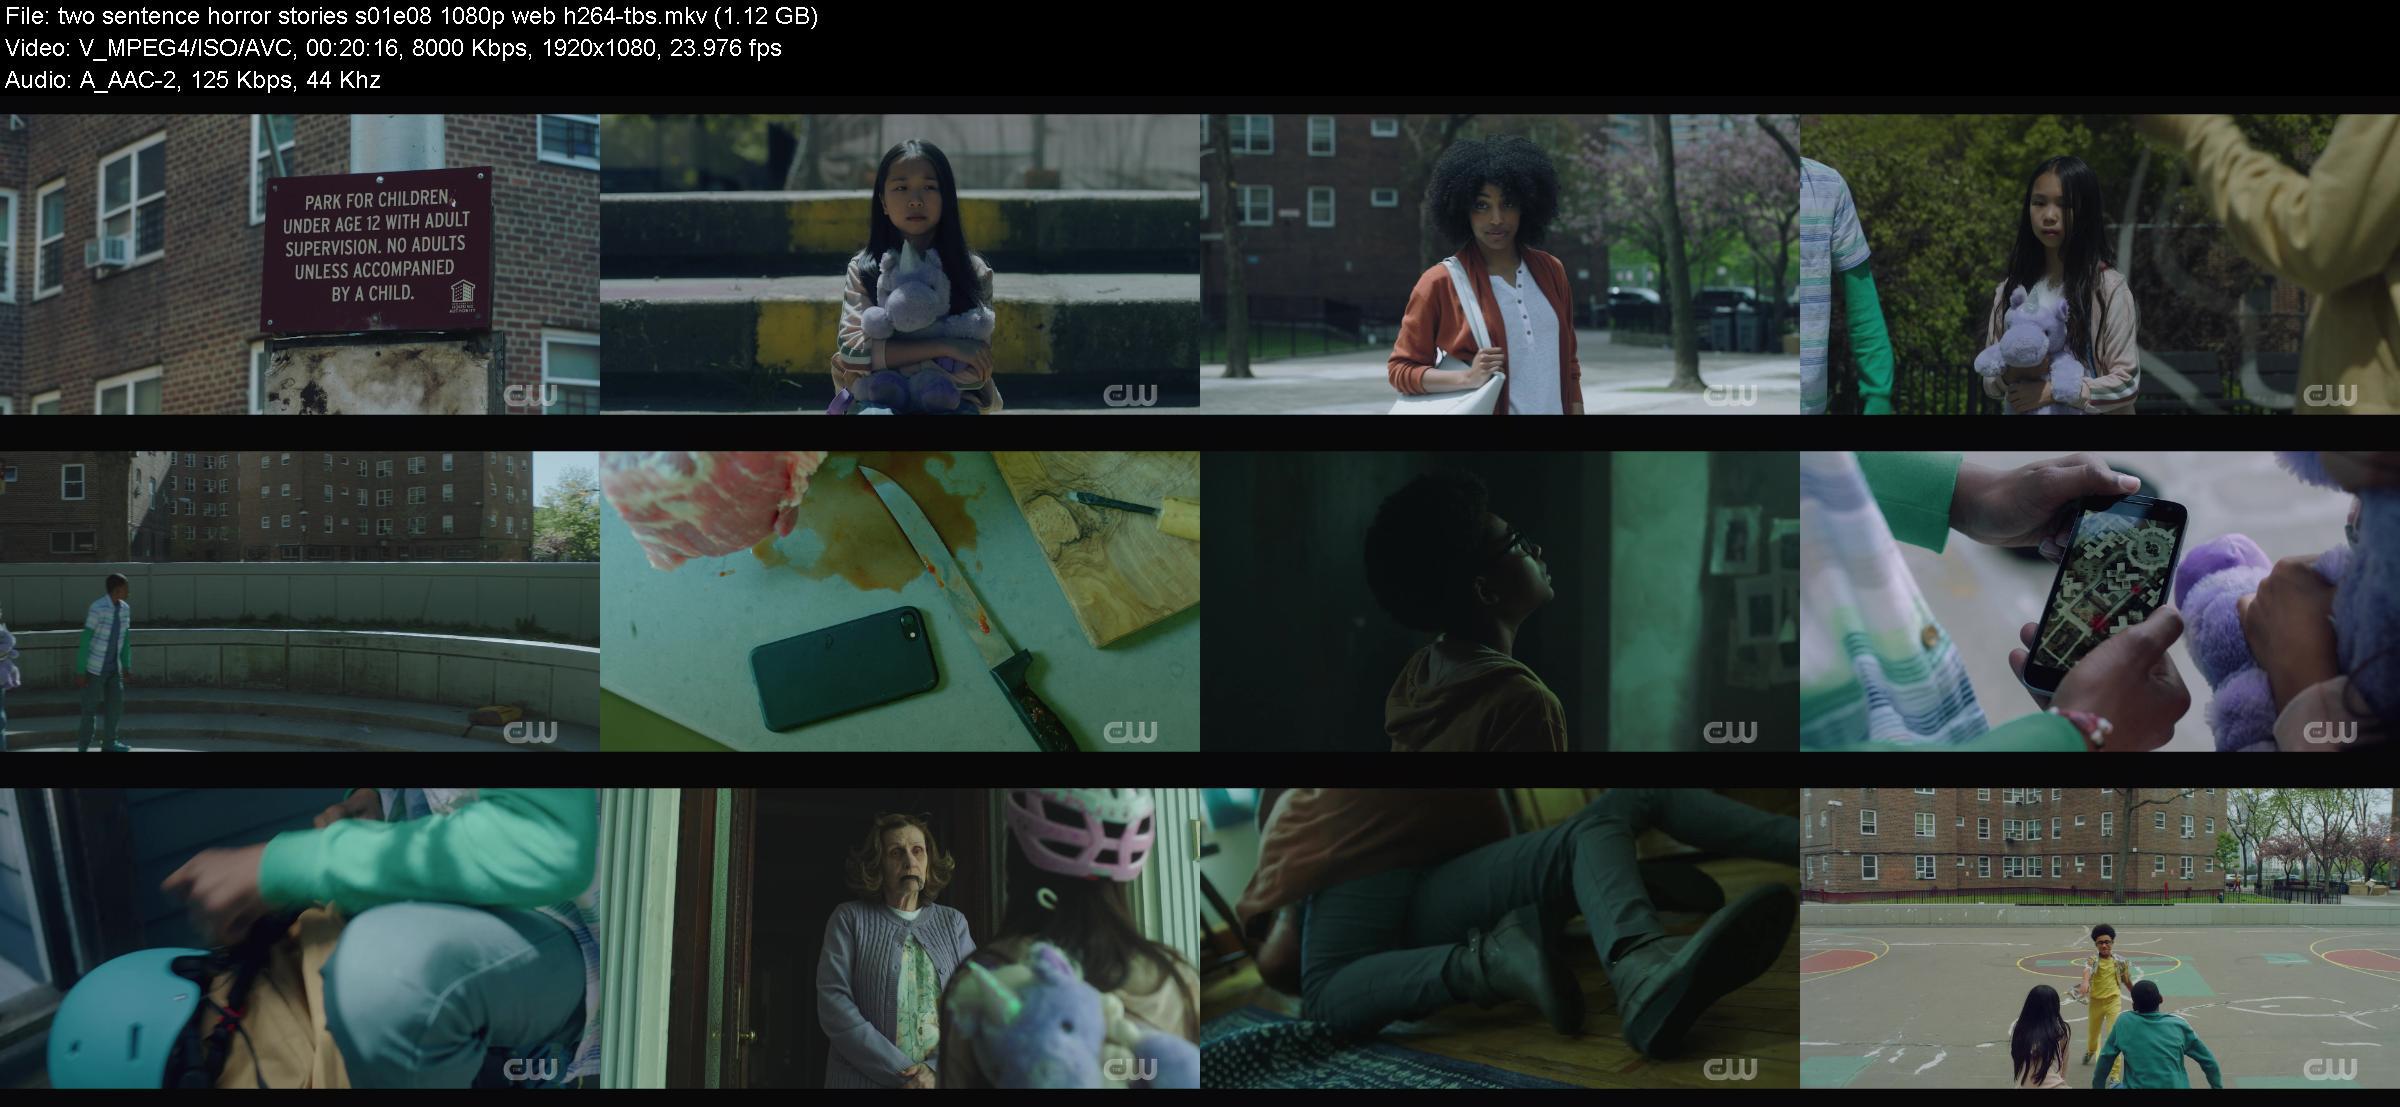 Two Sentence Horror Stories S01E08 1080p WEB h264-TBS